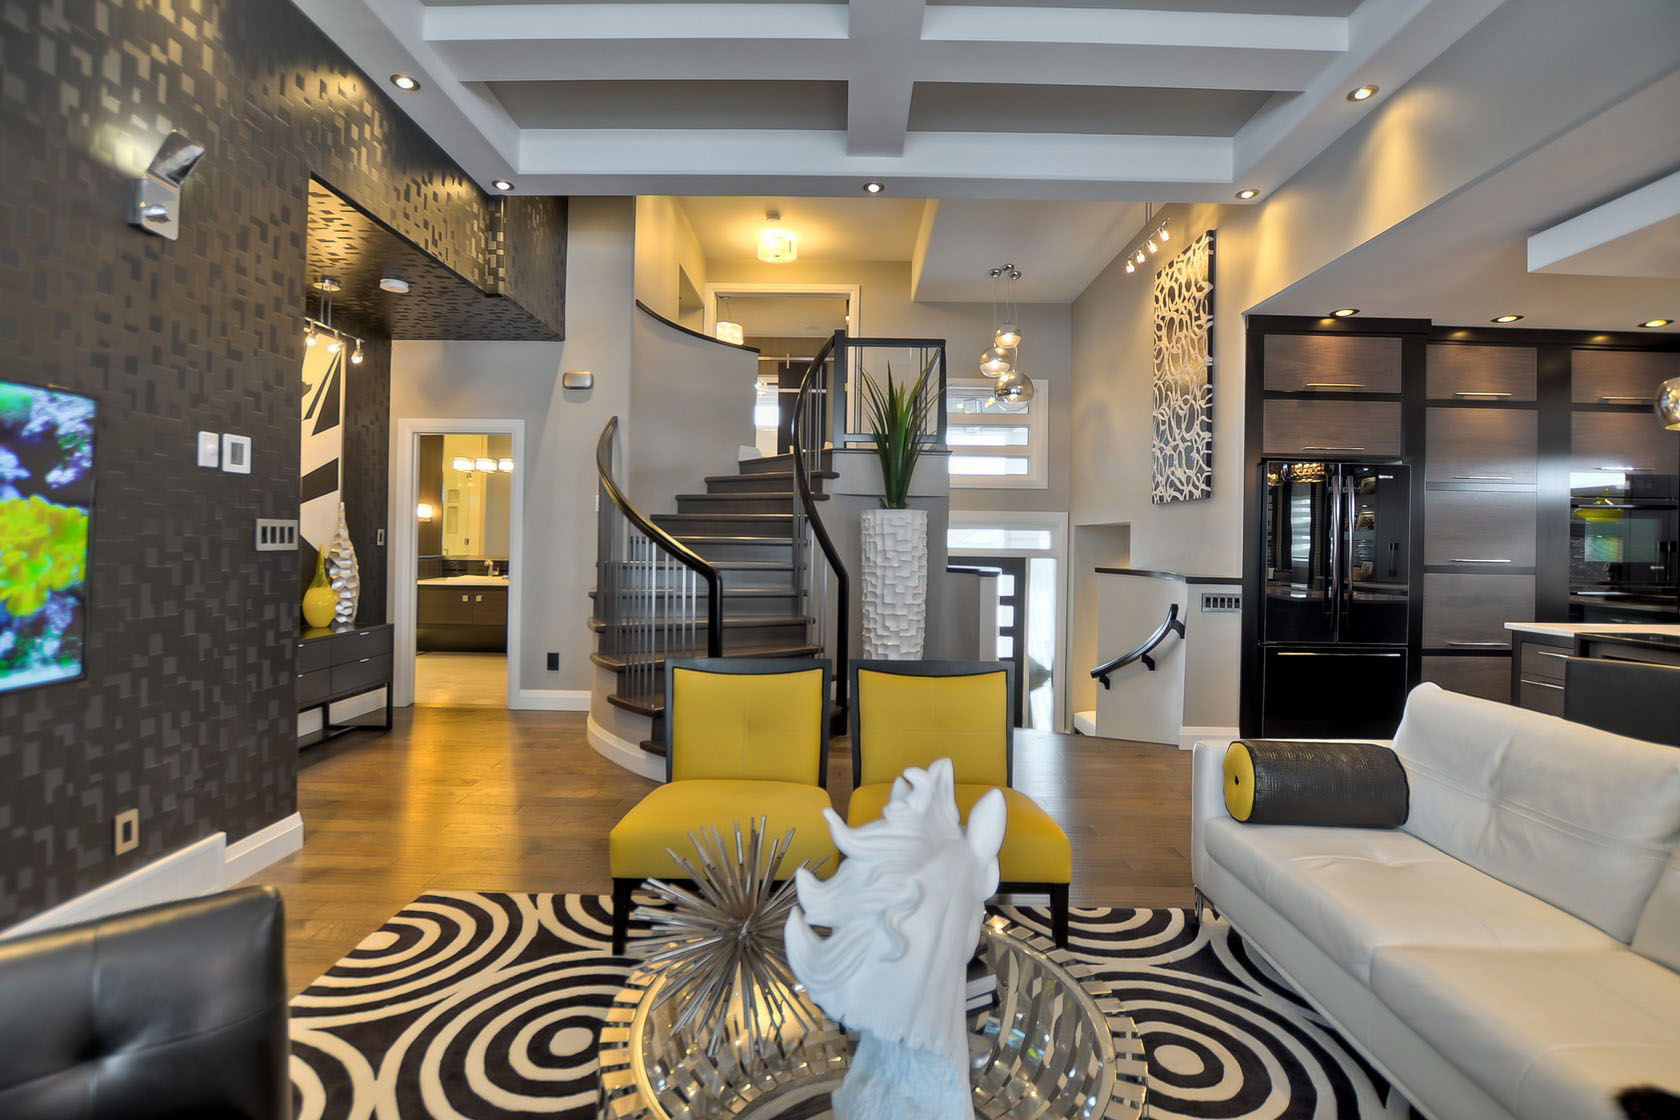 Contemporary Custom Dream Home In Saskatoon With Inspiring ... on Dream Home Interior  id=55695